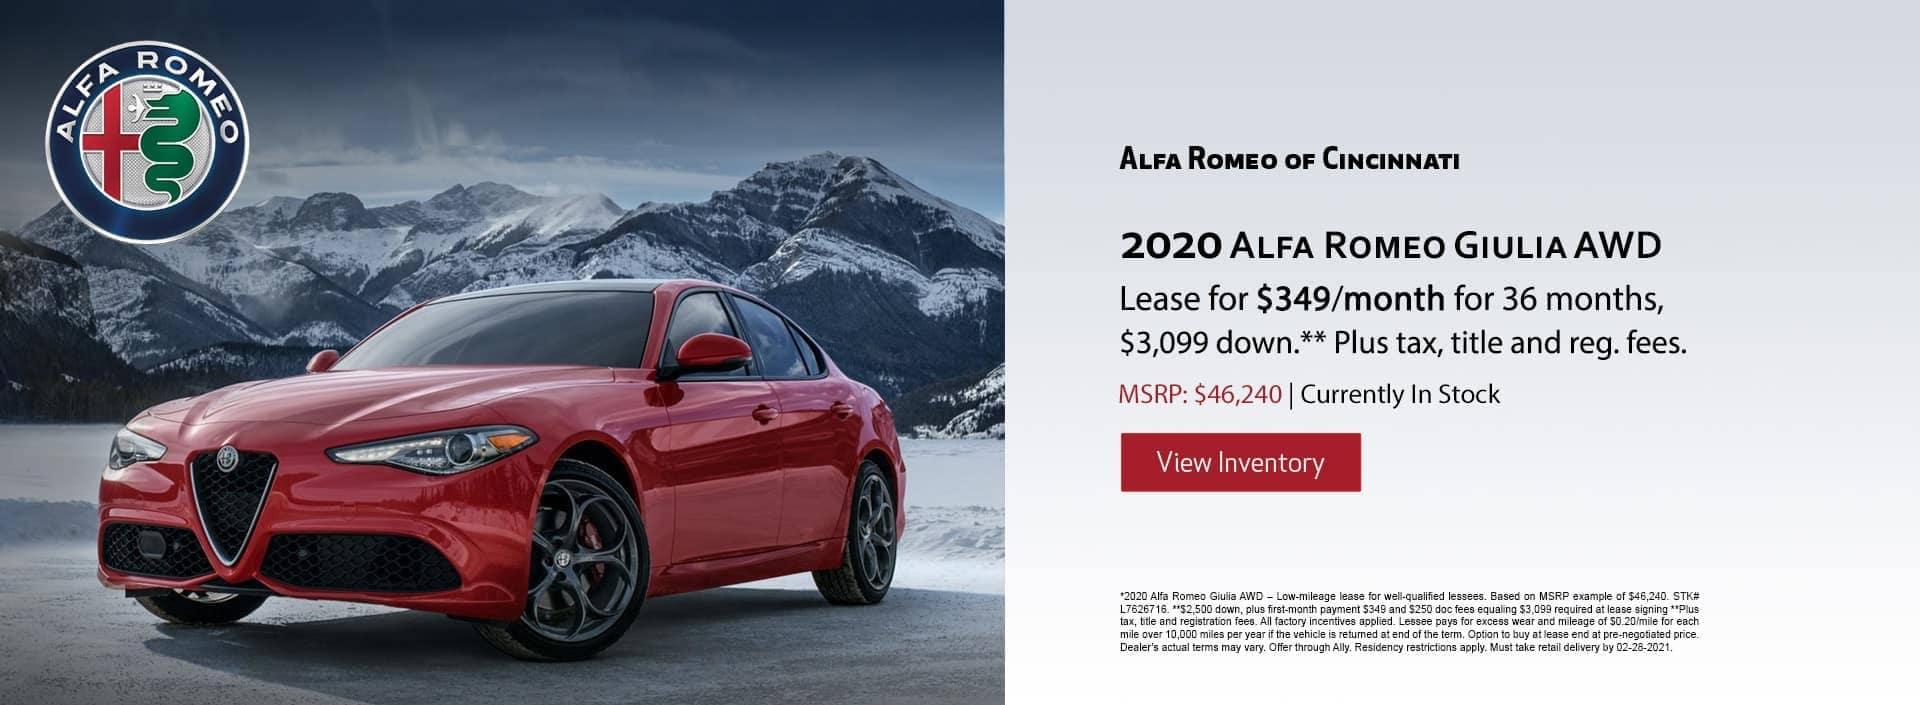 Alfa Romeo of Cincinnati Specials